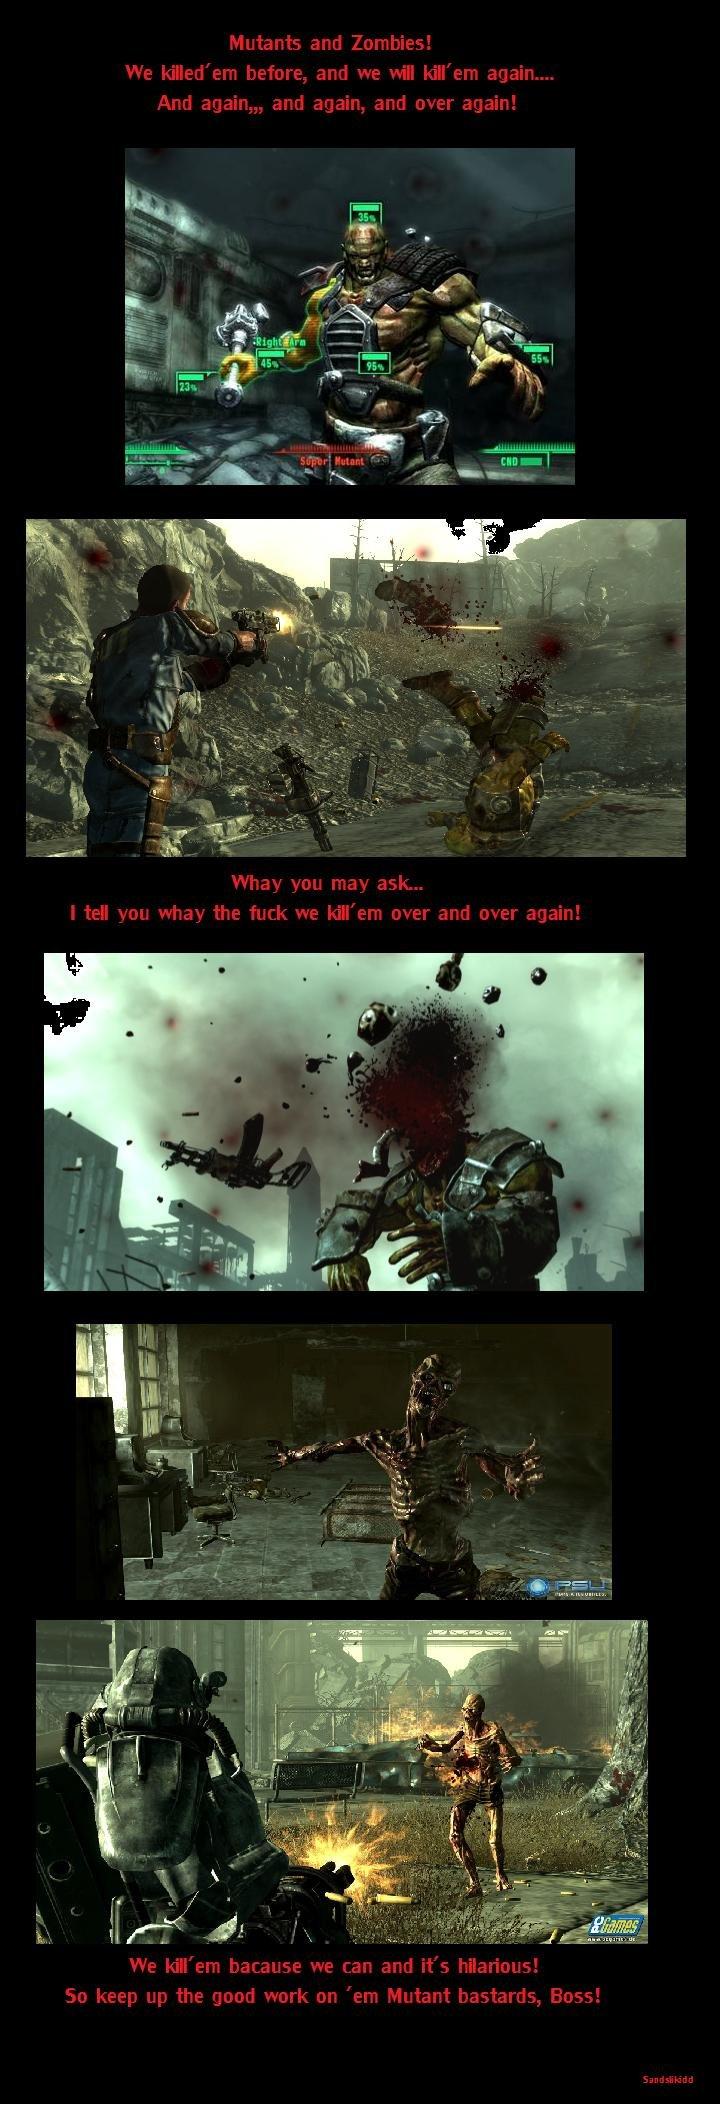 Mutants and Zombies, kill'em!. .